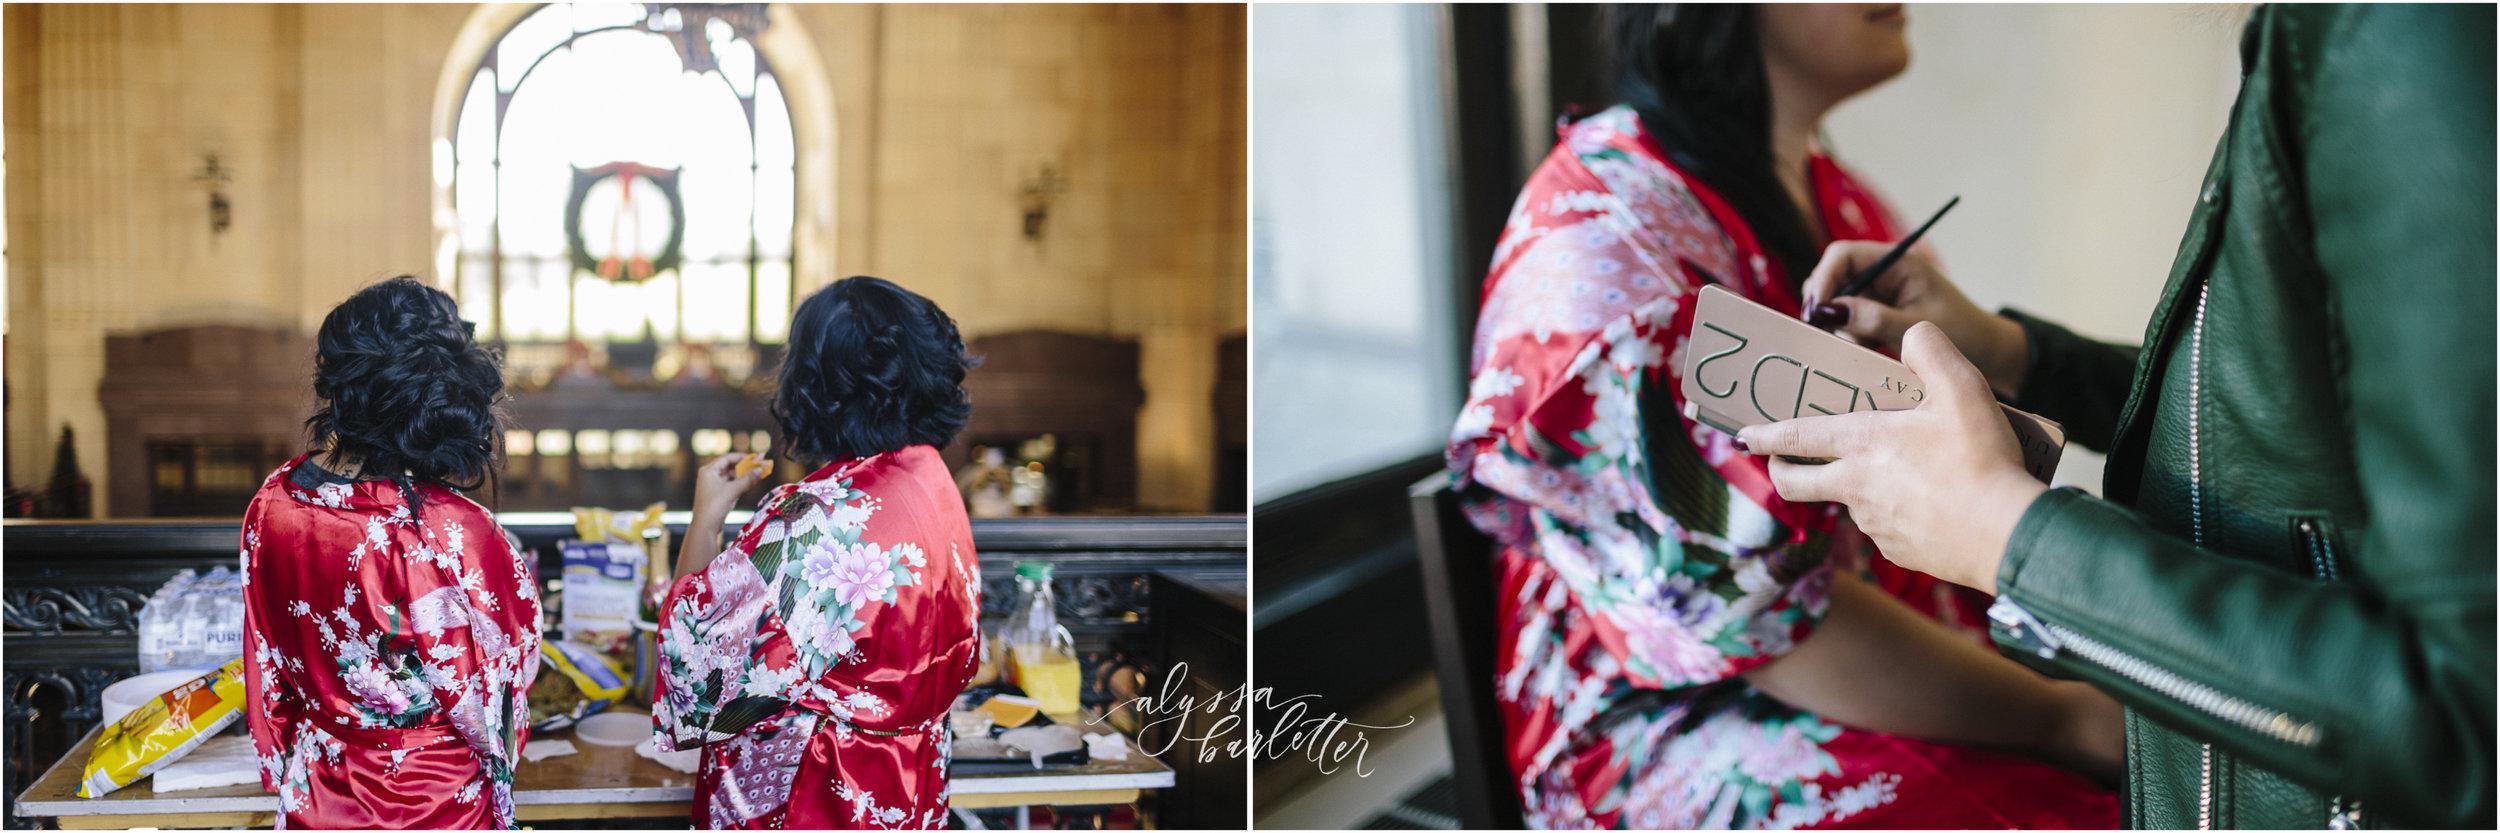 alyssa barletter photography union station wedding photos leopard print winter wedding-1-2.jpg